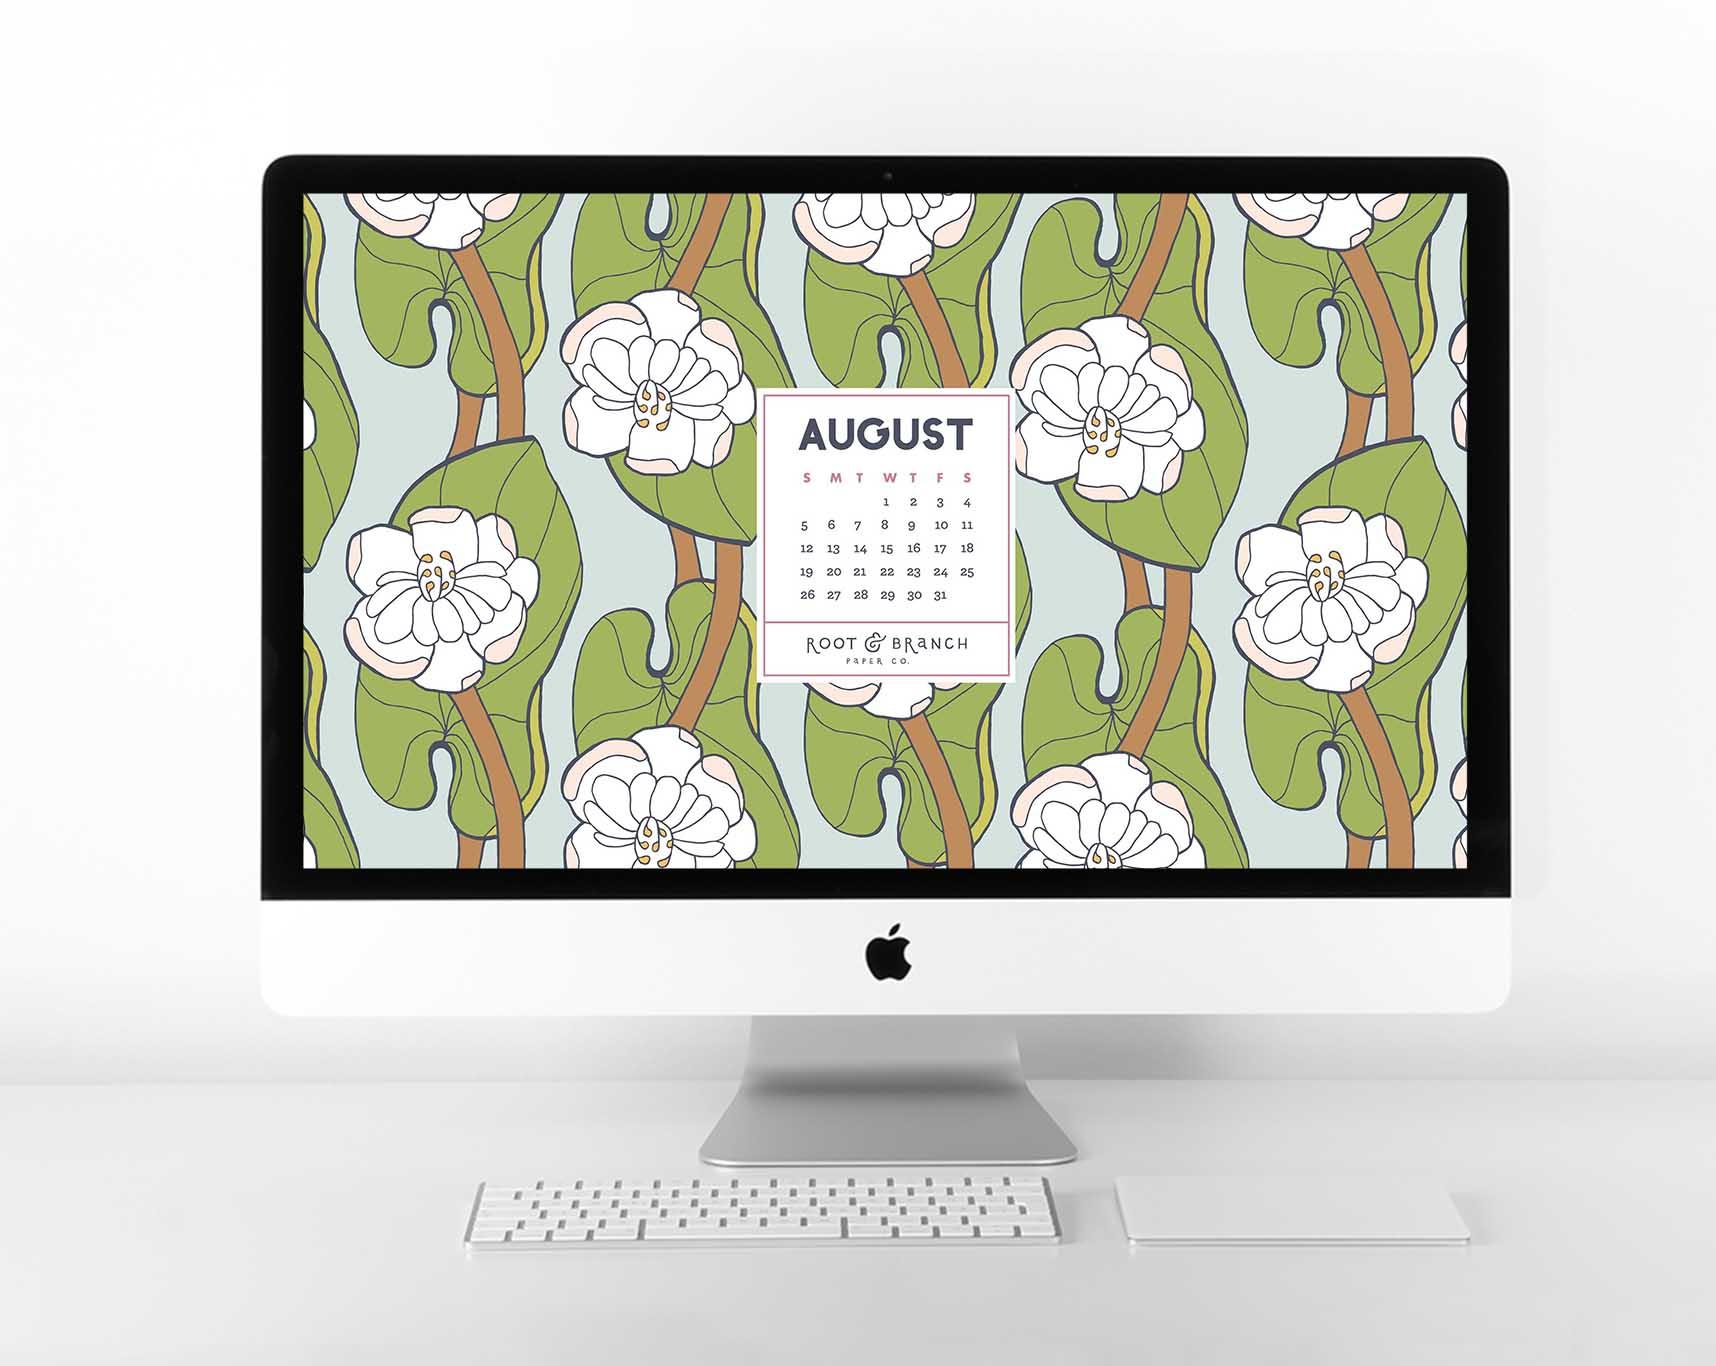 August 2018 Digital Calendar, Desktop Wallpaper, Floral Illustrated Calendar Wallpaper for Desktop, Tablet, and Phone // Root & Branch Paper Co. Blog